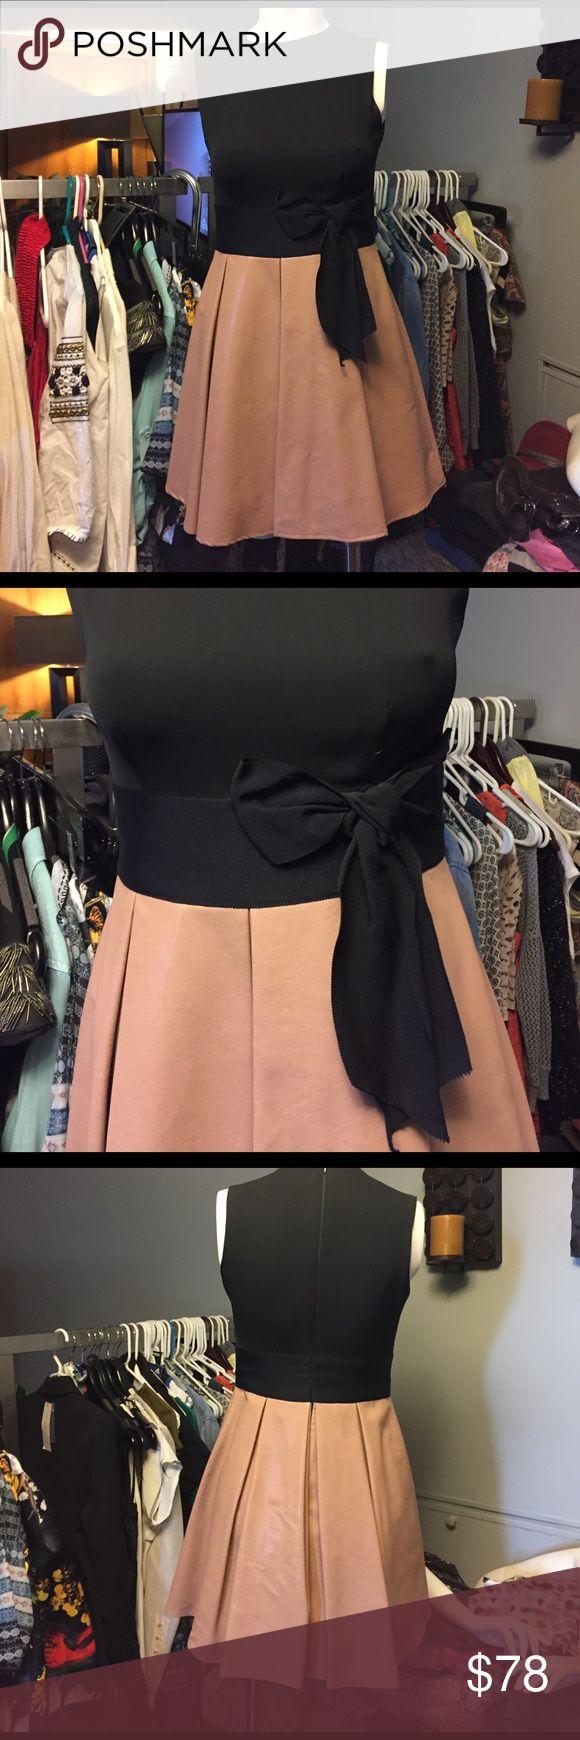 Eva Franco faux leather dress size 2pre-owned Eva Franco faux leather dress size 2pre-owned Eva Franco Dresses Mini